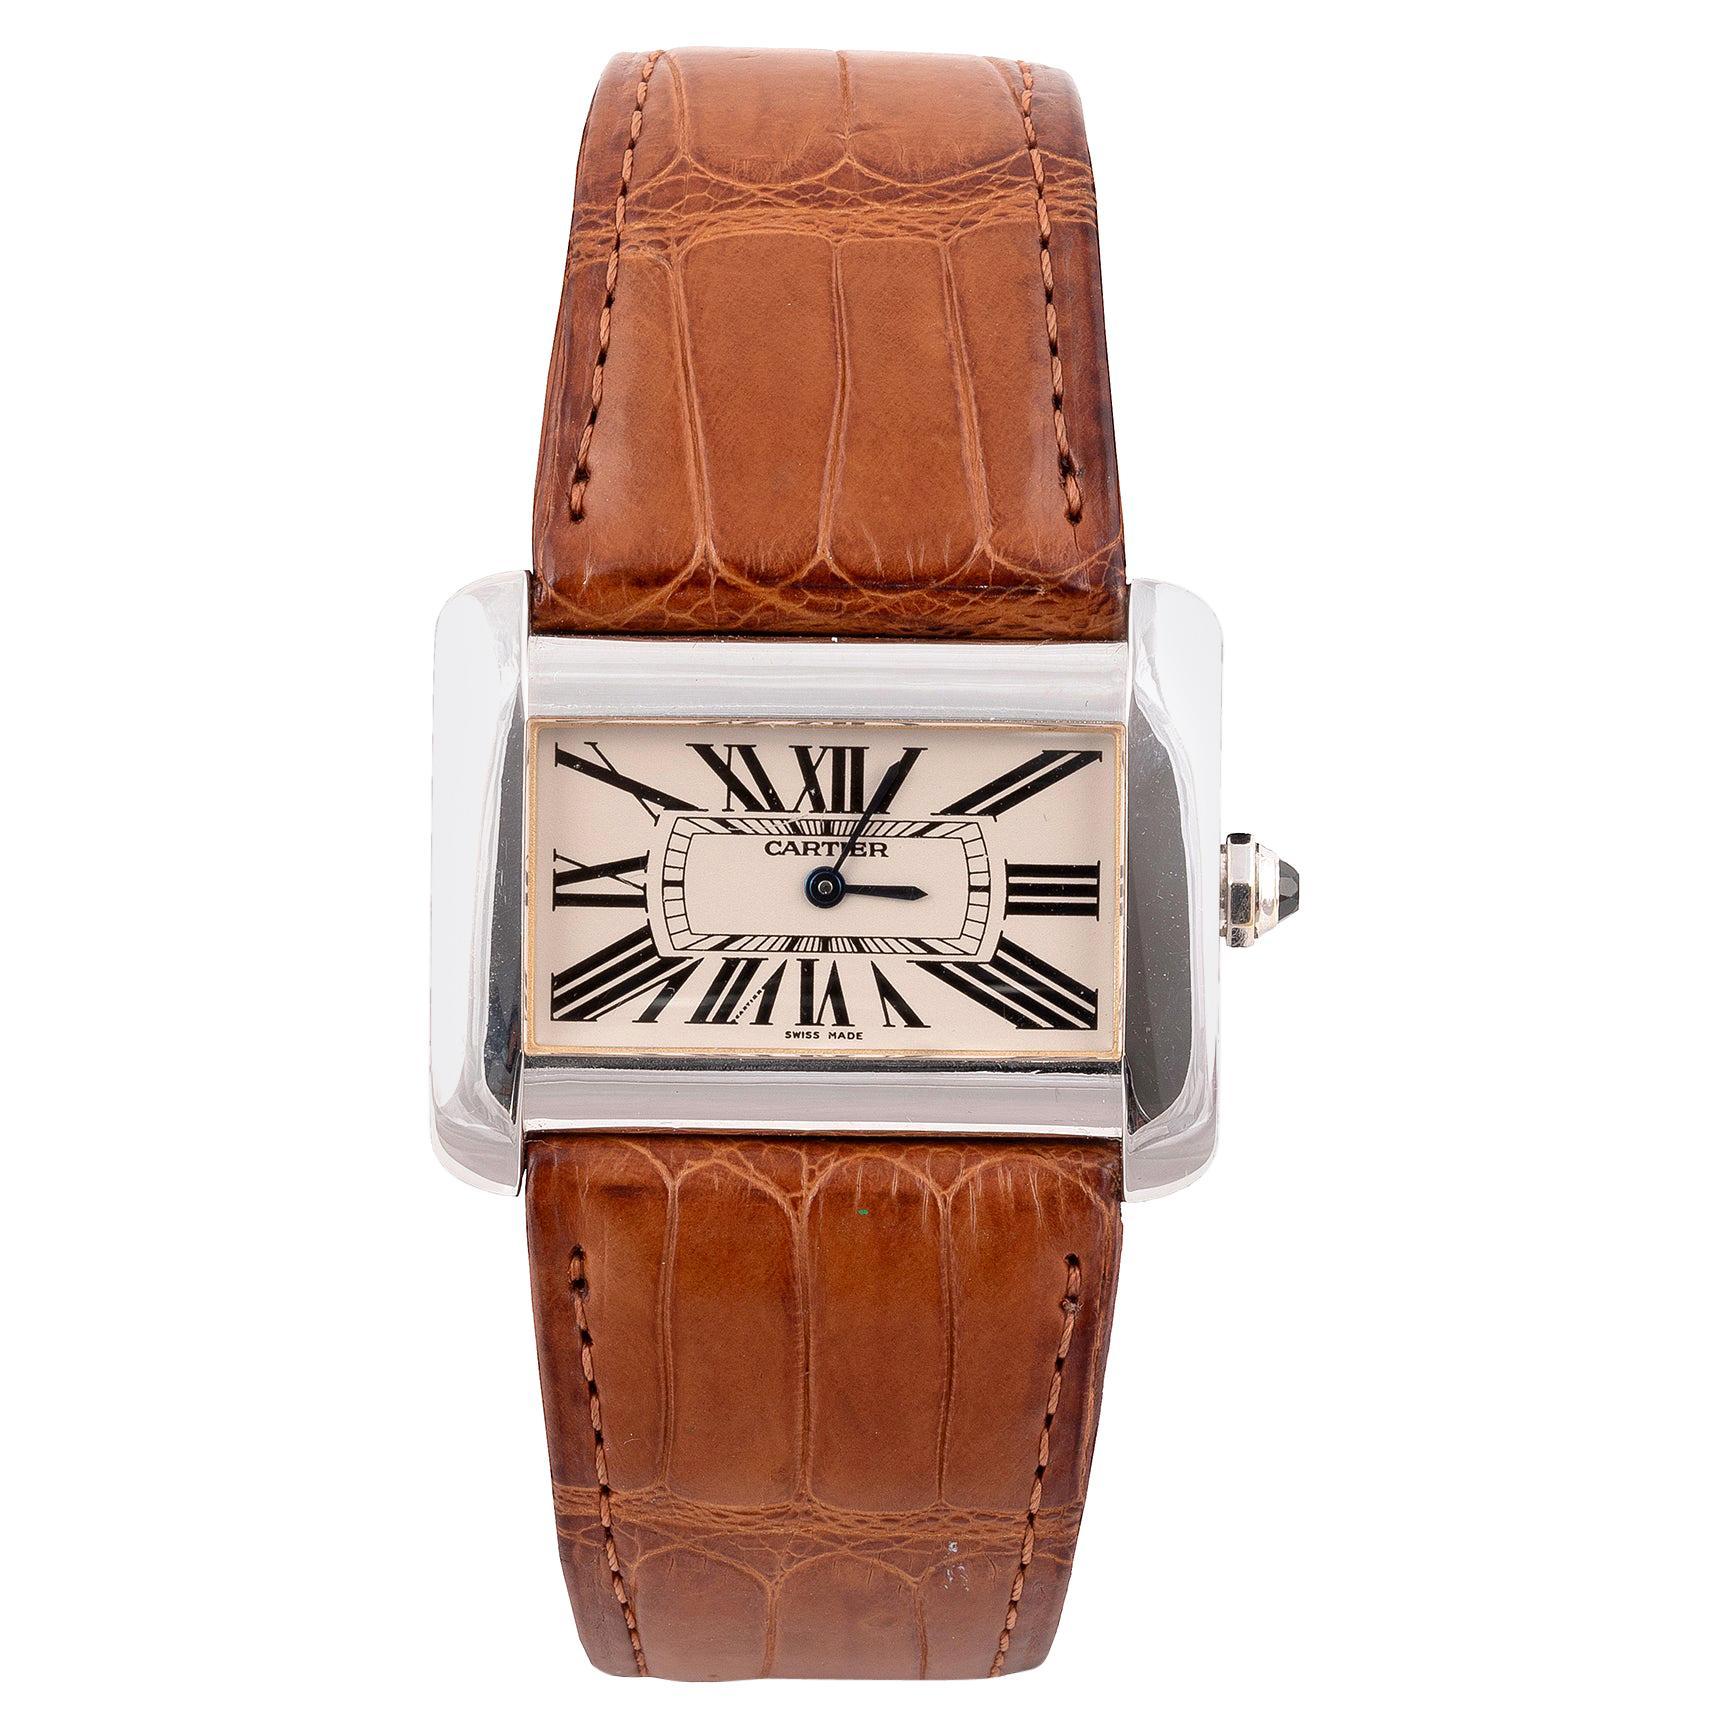 Cartier Ref. 2602 Tank Divan Quartz White Gold Wristwatch